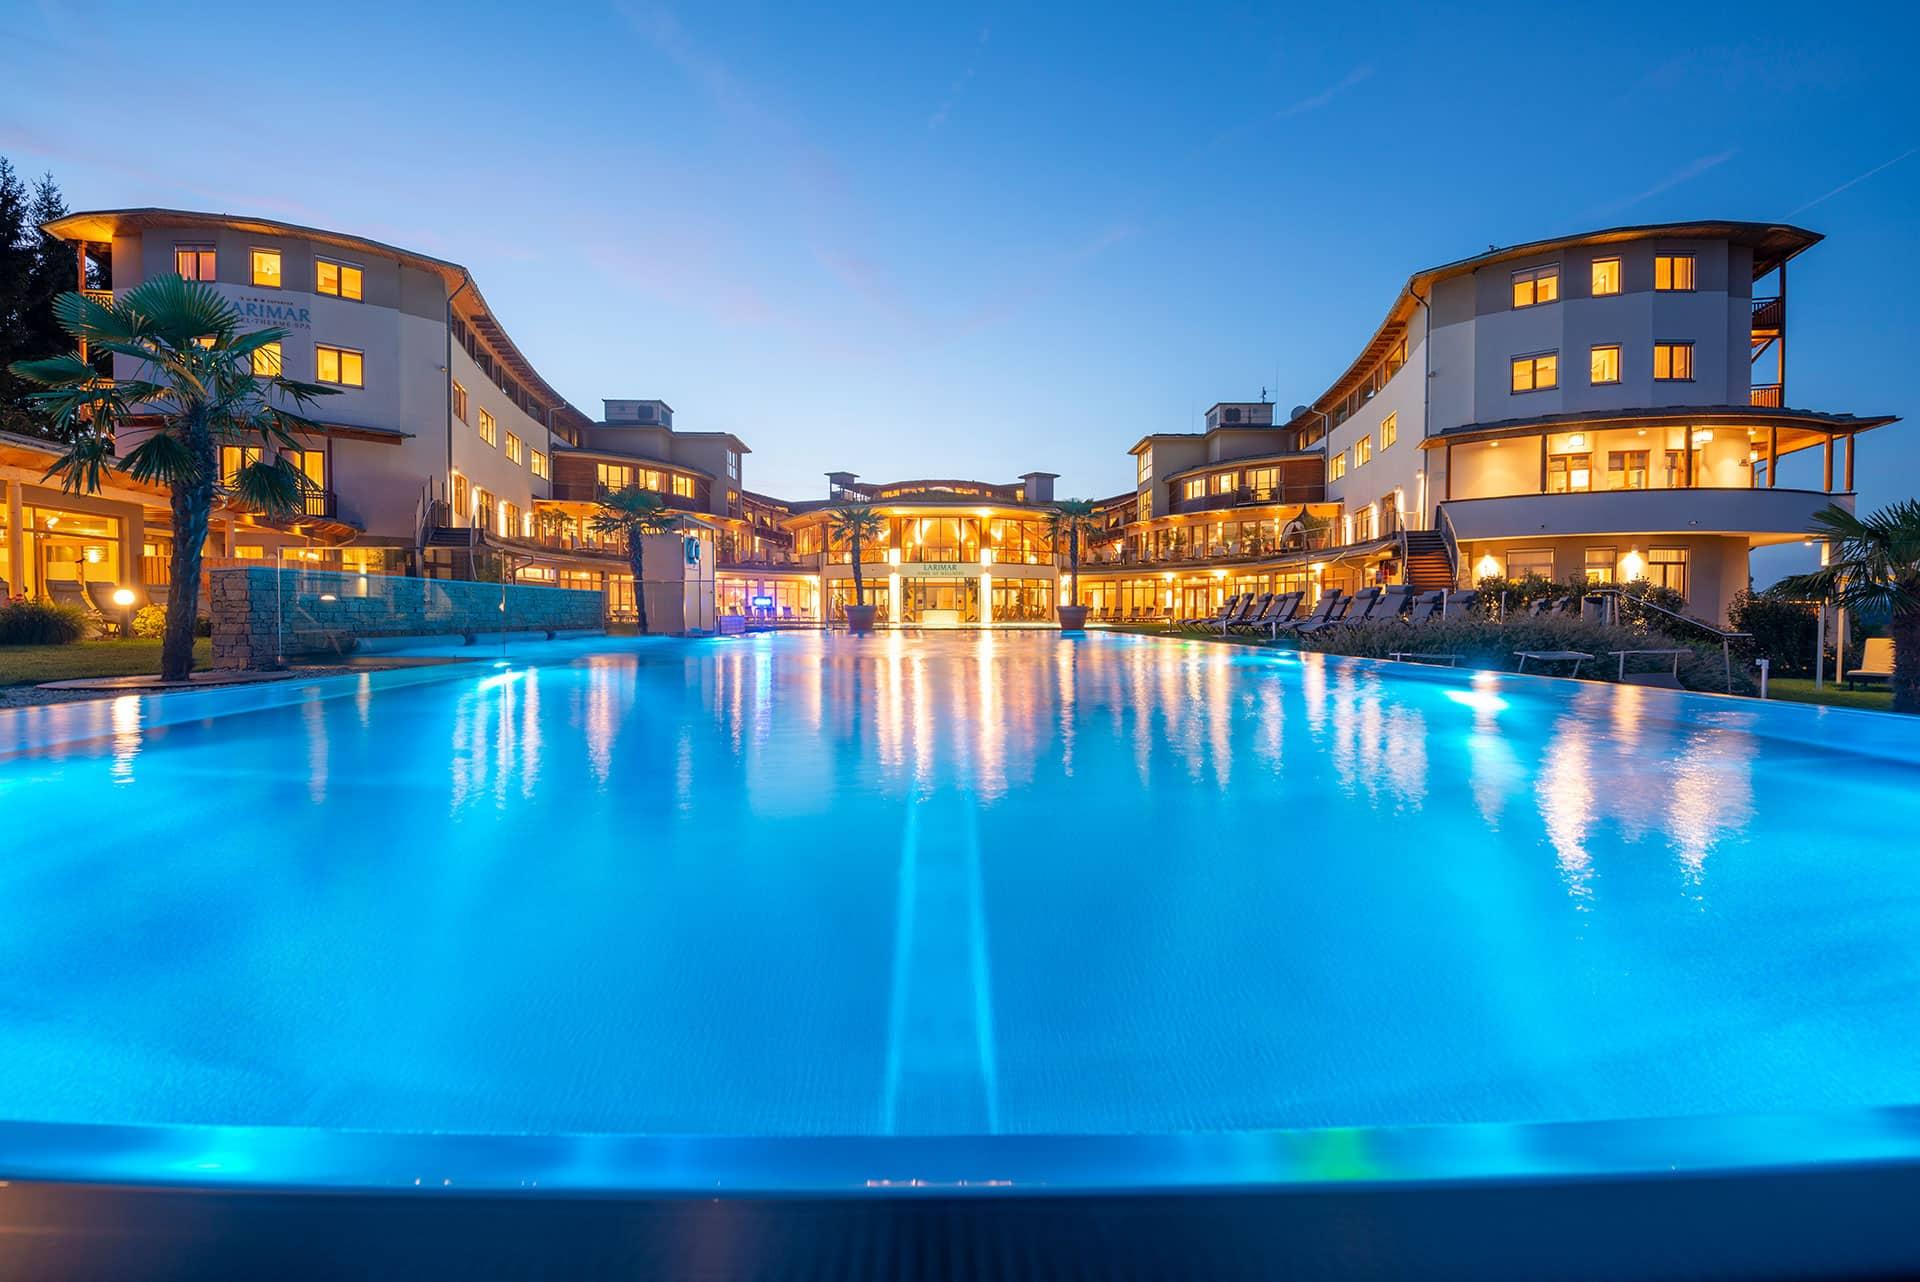 Hotel Larimar mit großem Infinitypool